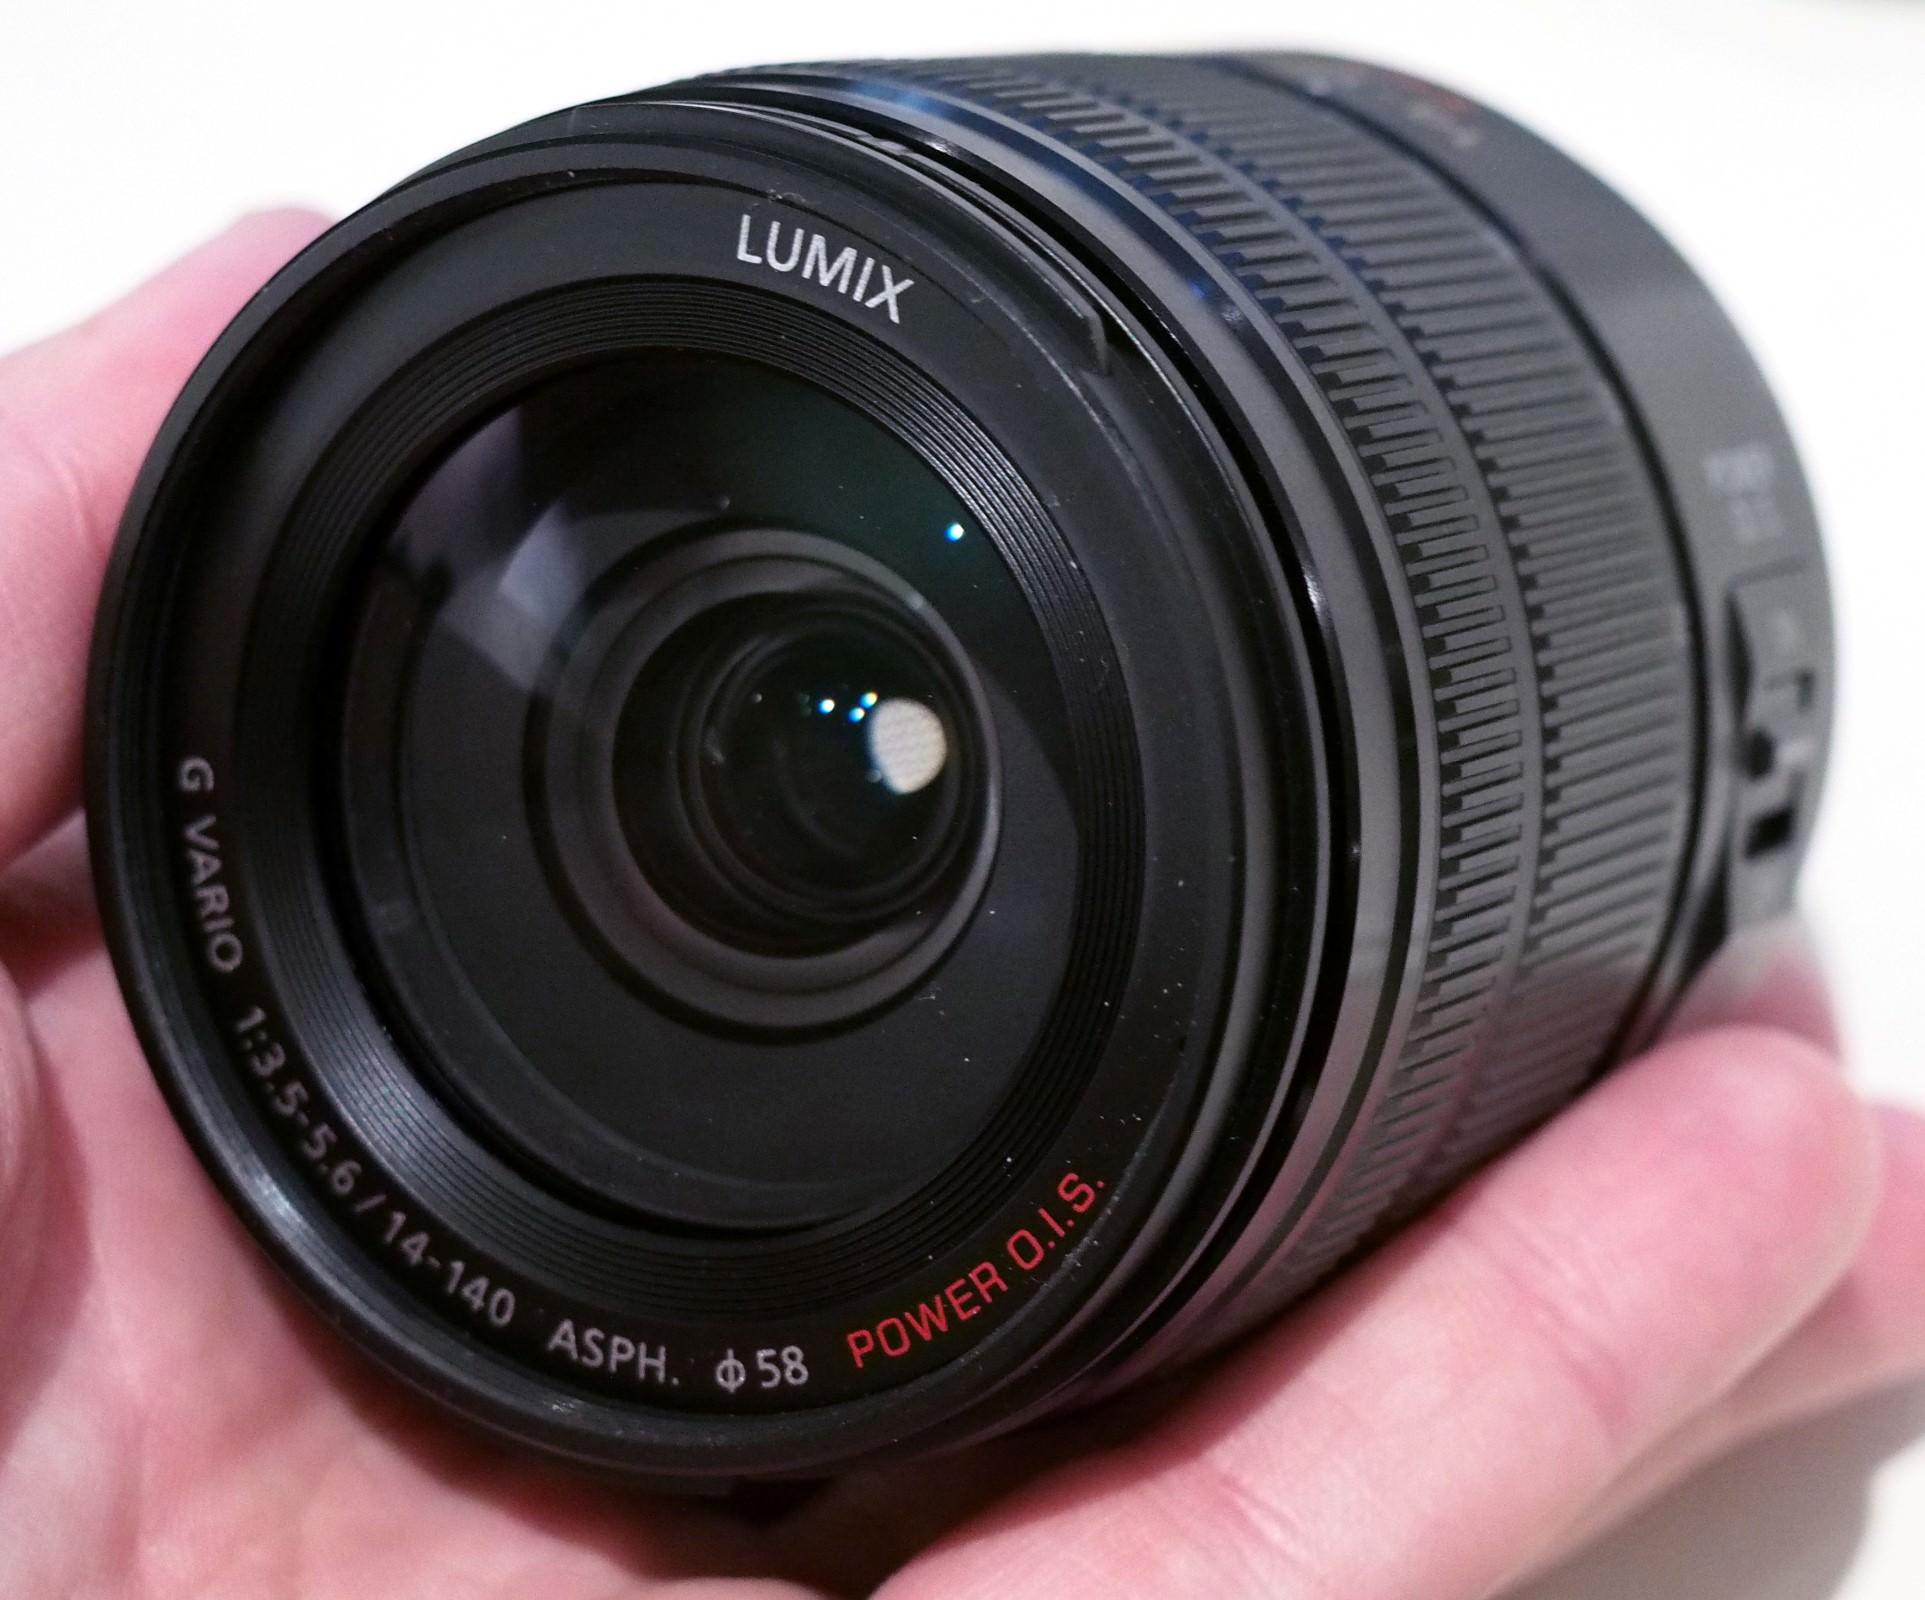 Panasonic Lumix G Vario 14-140mm f/3.5-5.6 ASPH OIS Lens